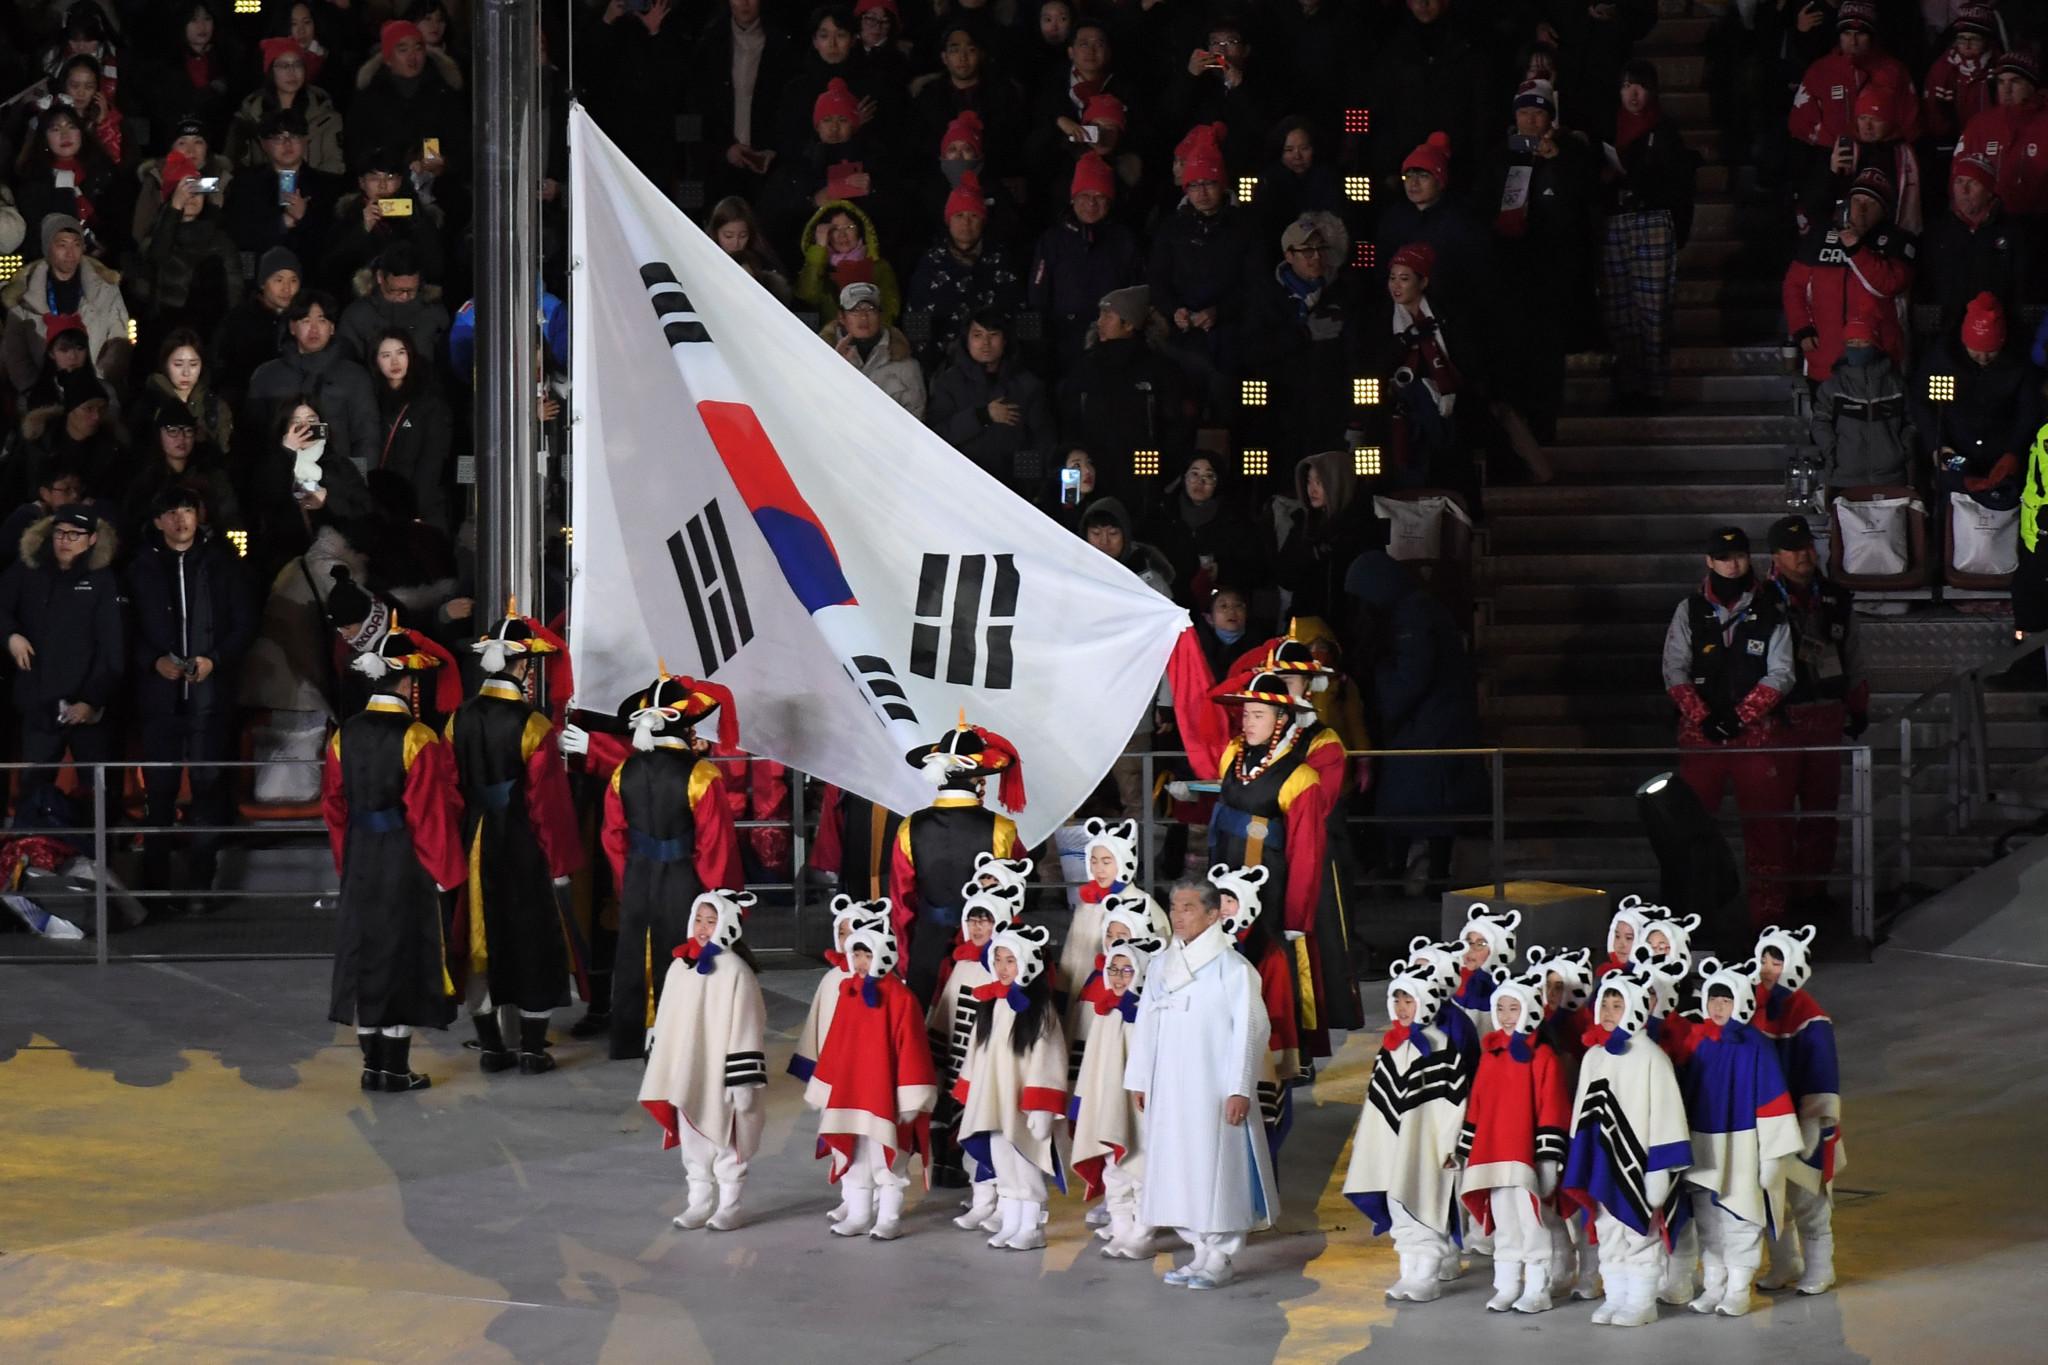 More than 200,000 visitors recorded at Team Korea House during Pyeongchang 2018